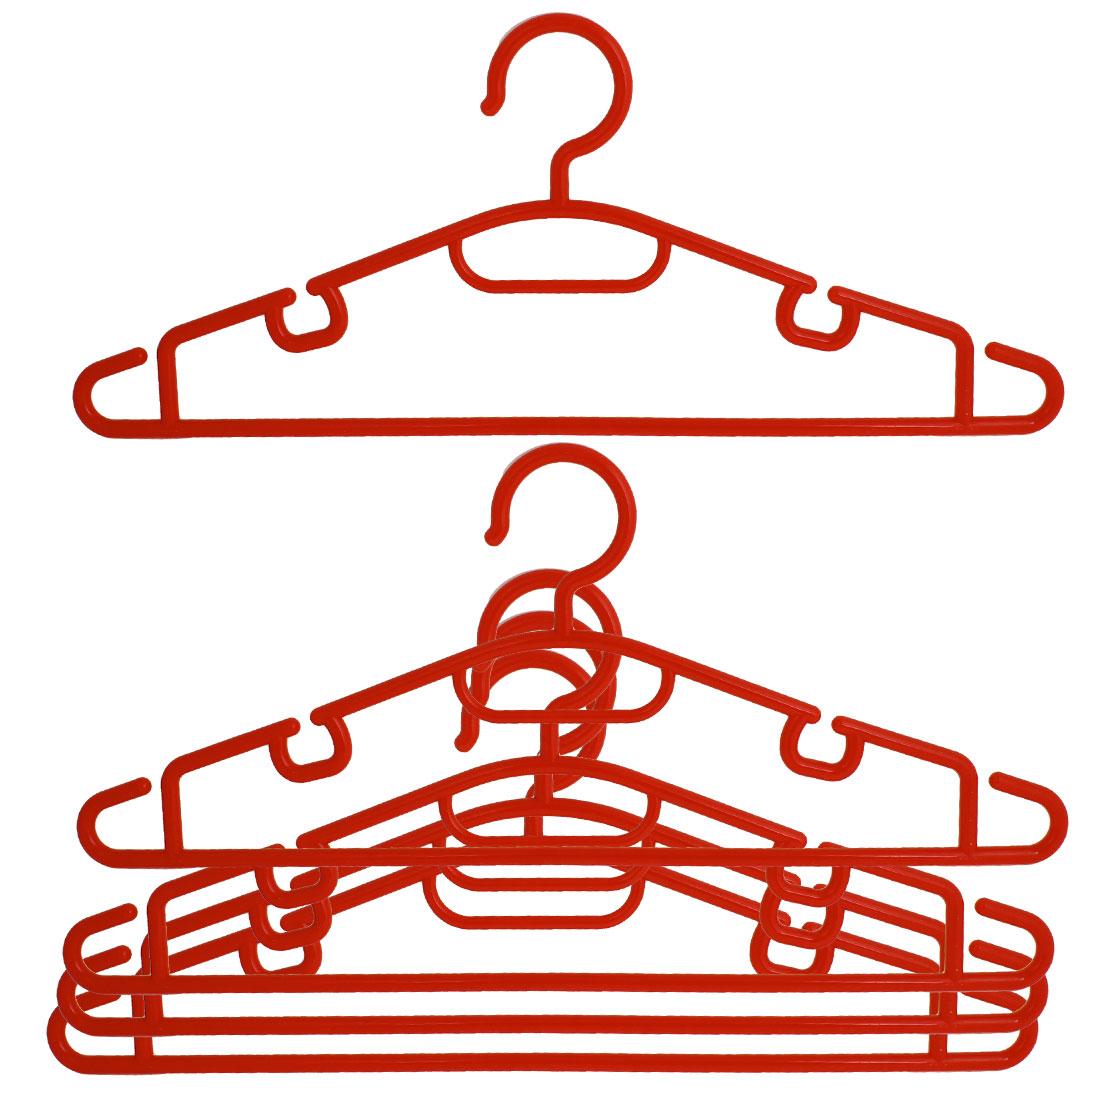 Red Plastic Garment Coat Pans Hanging Mini Clothes Hangers 5 Pcs